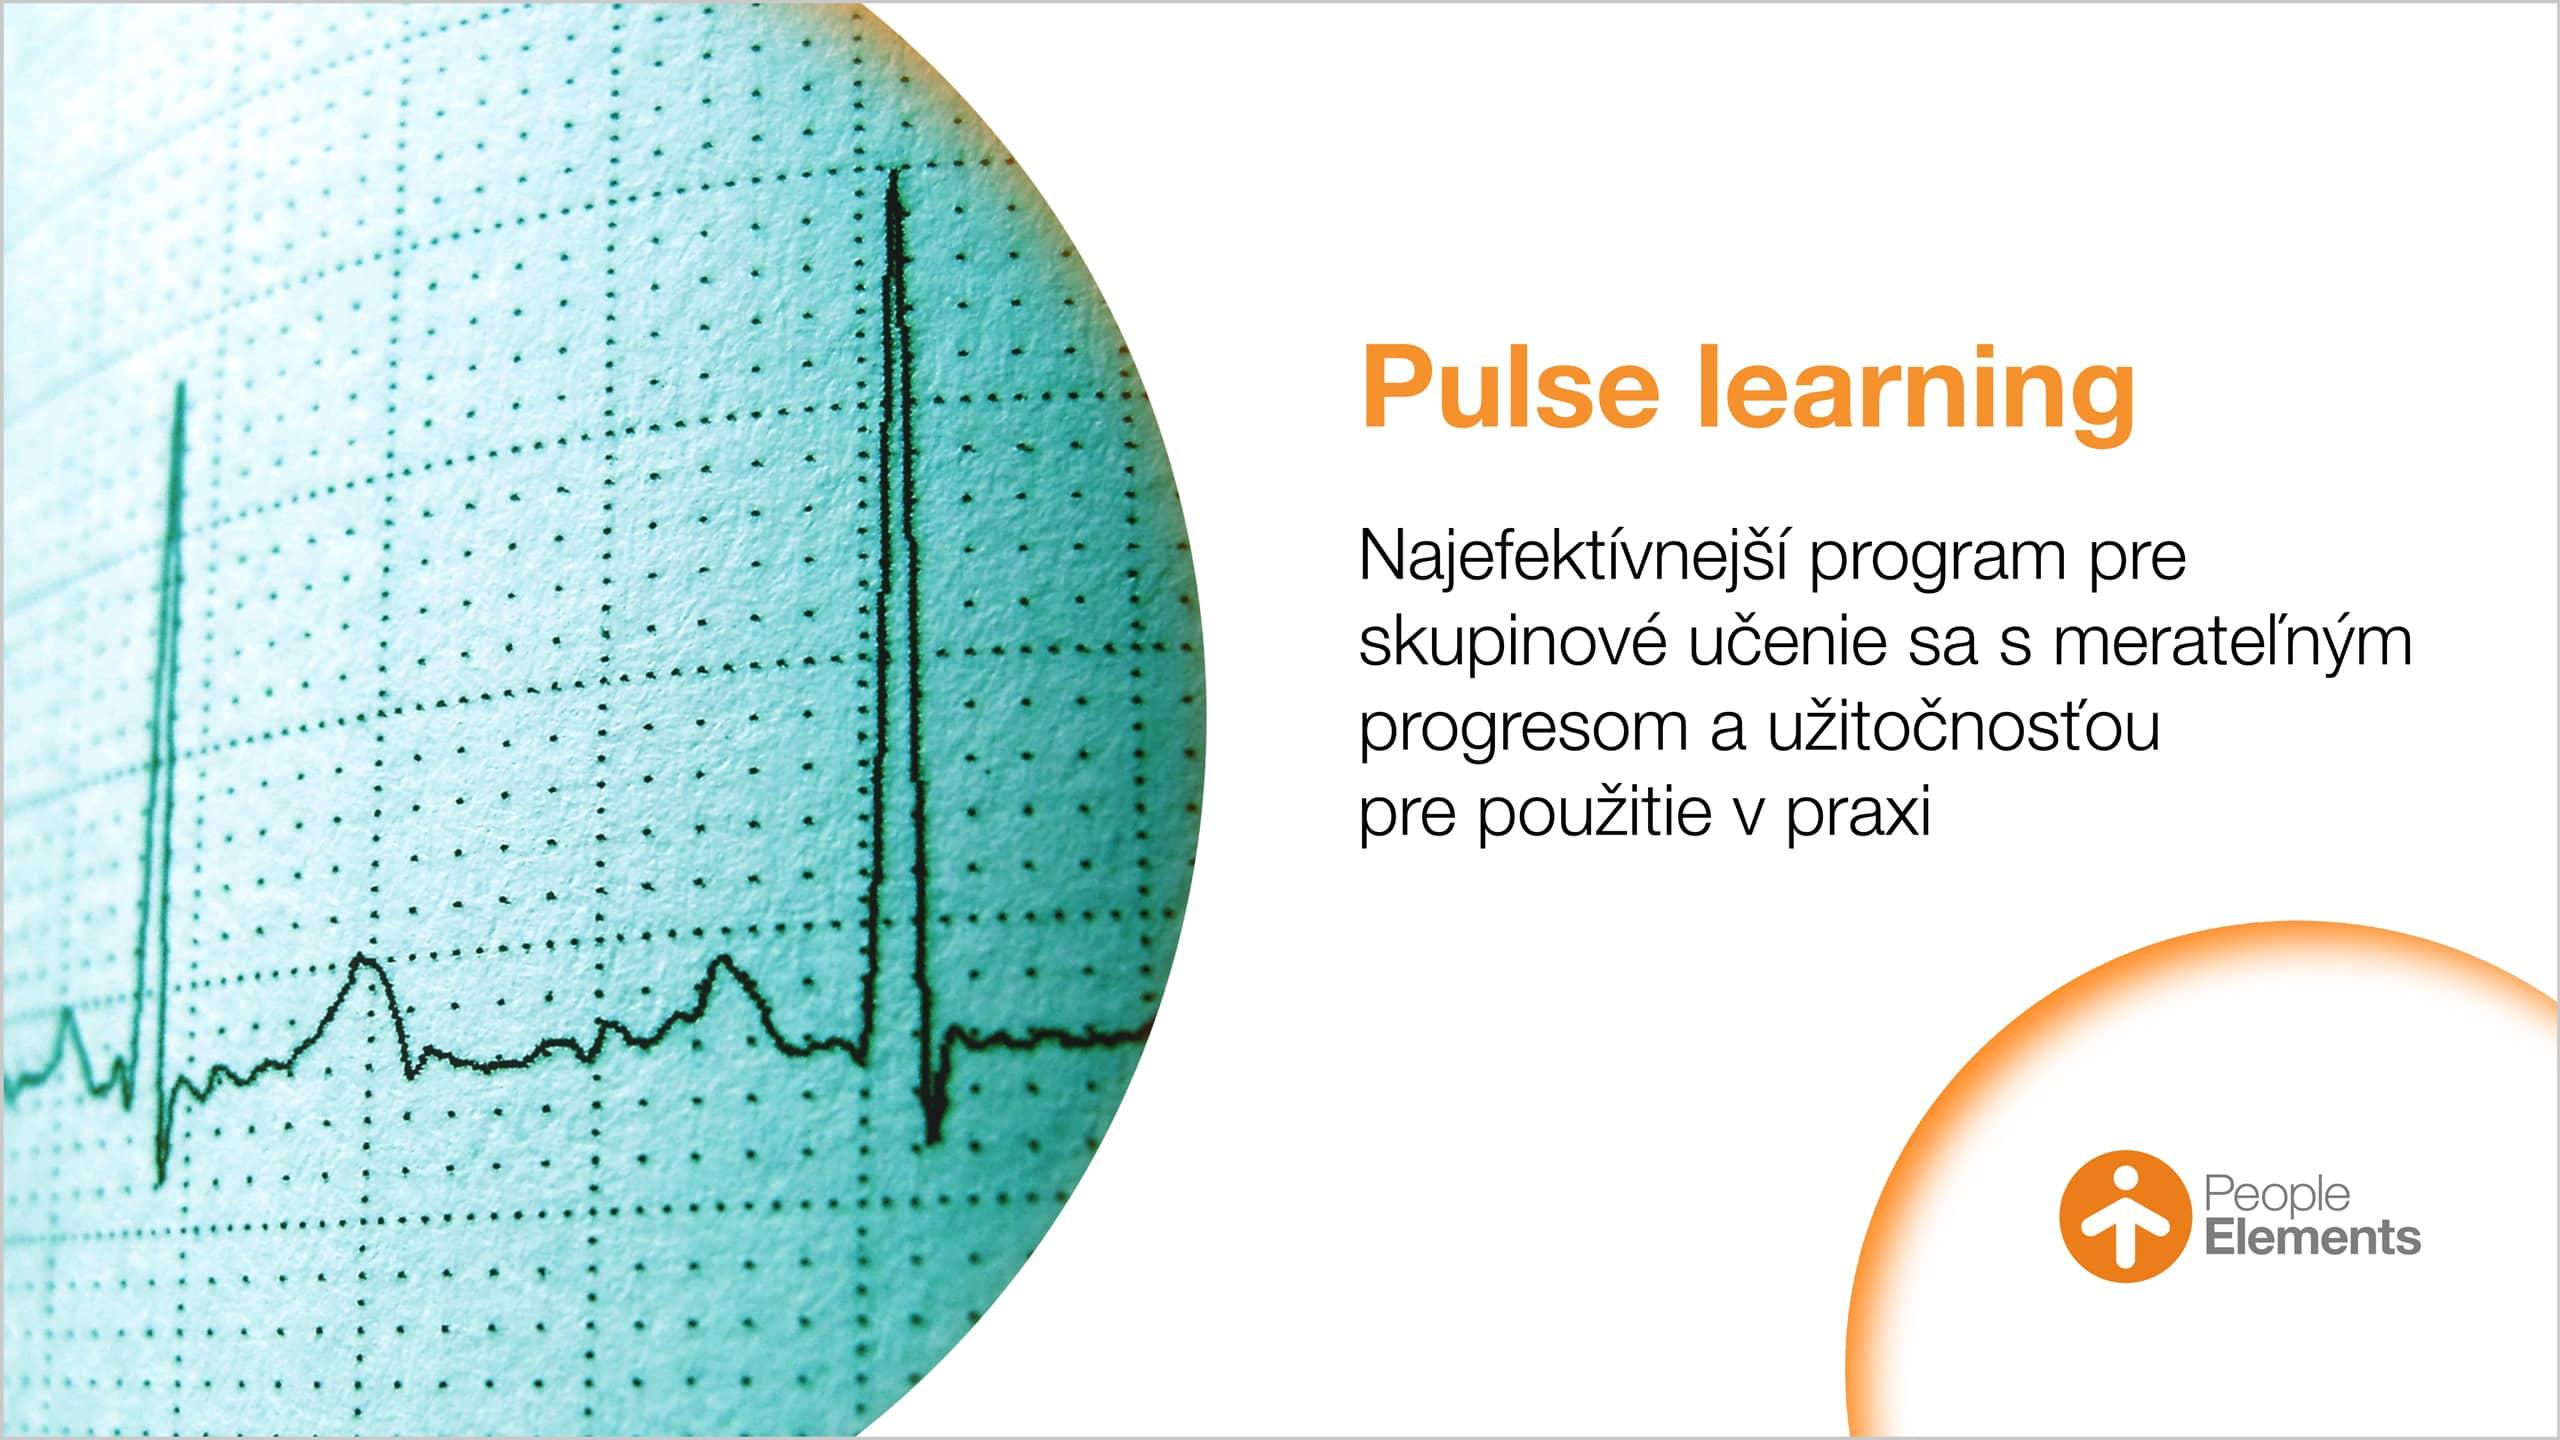 pe-banner-novinky-pulse-learning-1920x1080@2x-c